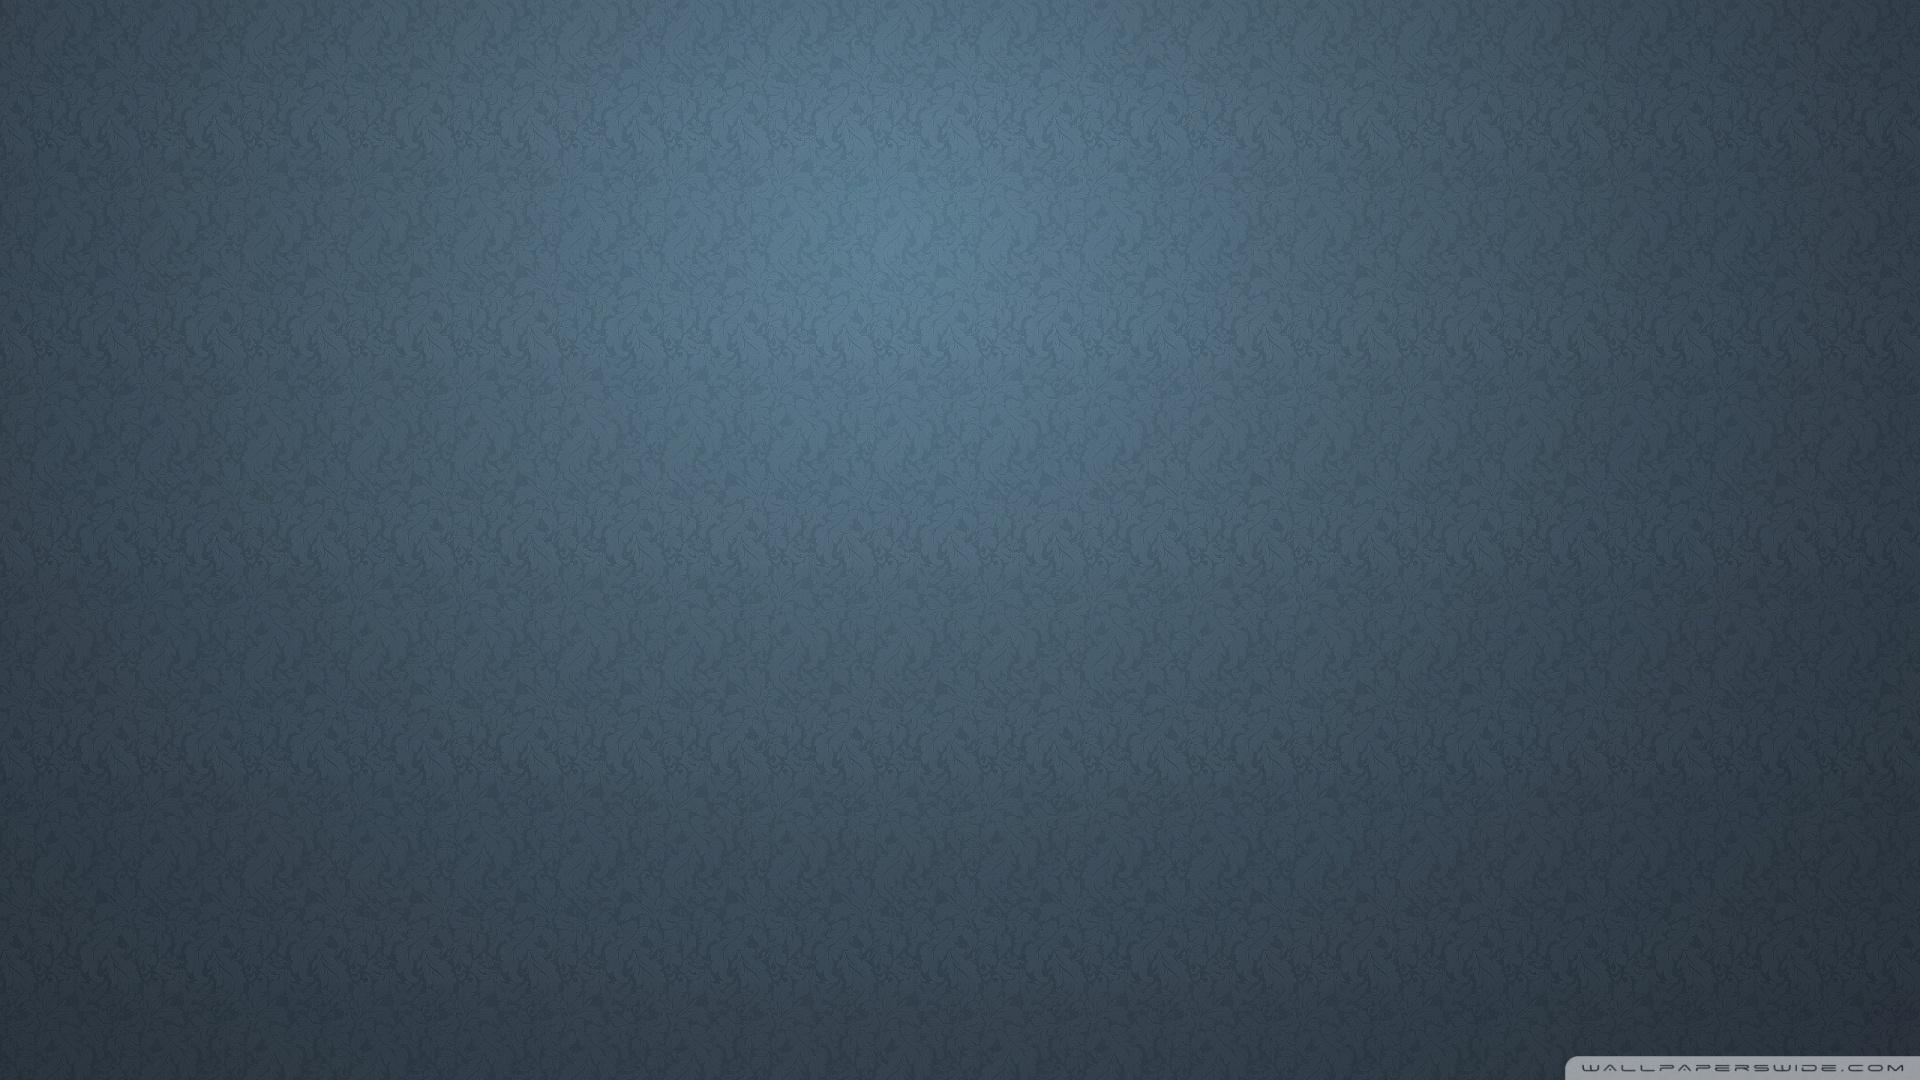 Blue gray wallpaper wallpapersafari for Grey patterned wallpaper